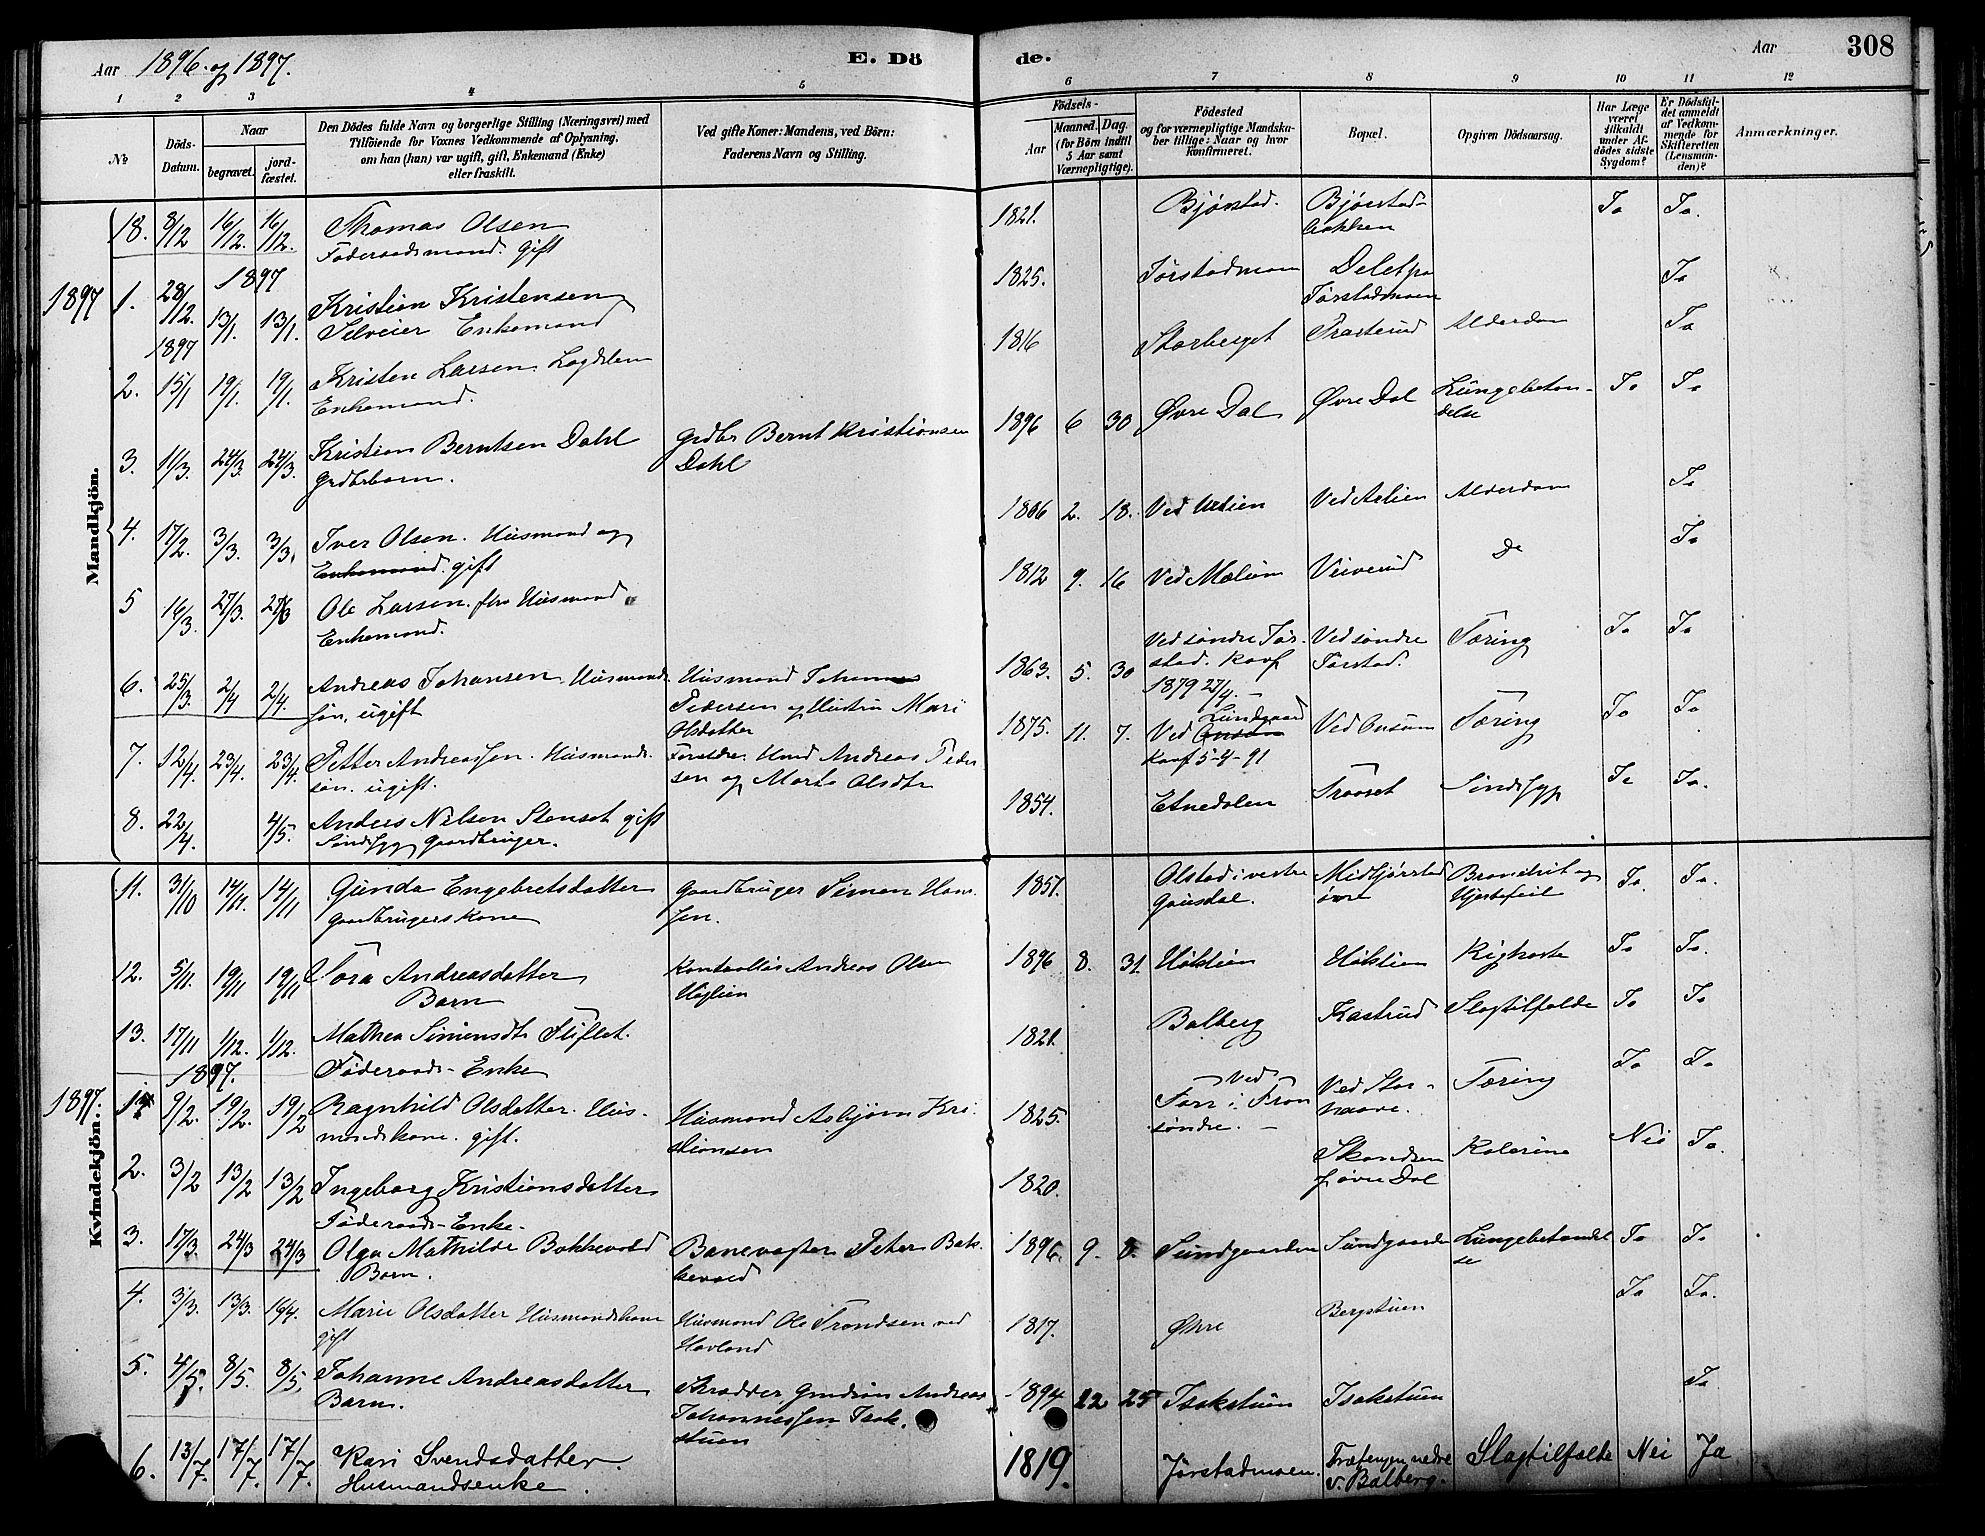 SAH, Fåberg prestekontor, Ministerialbok nr. 8, 1879-1898, s. 308